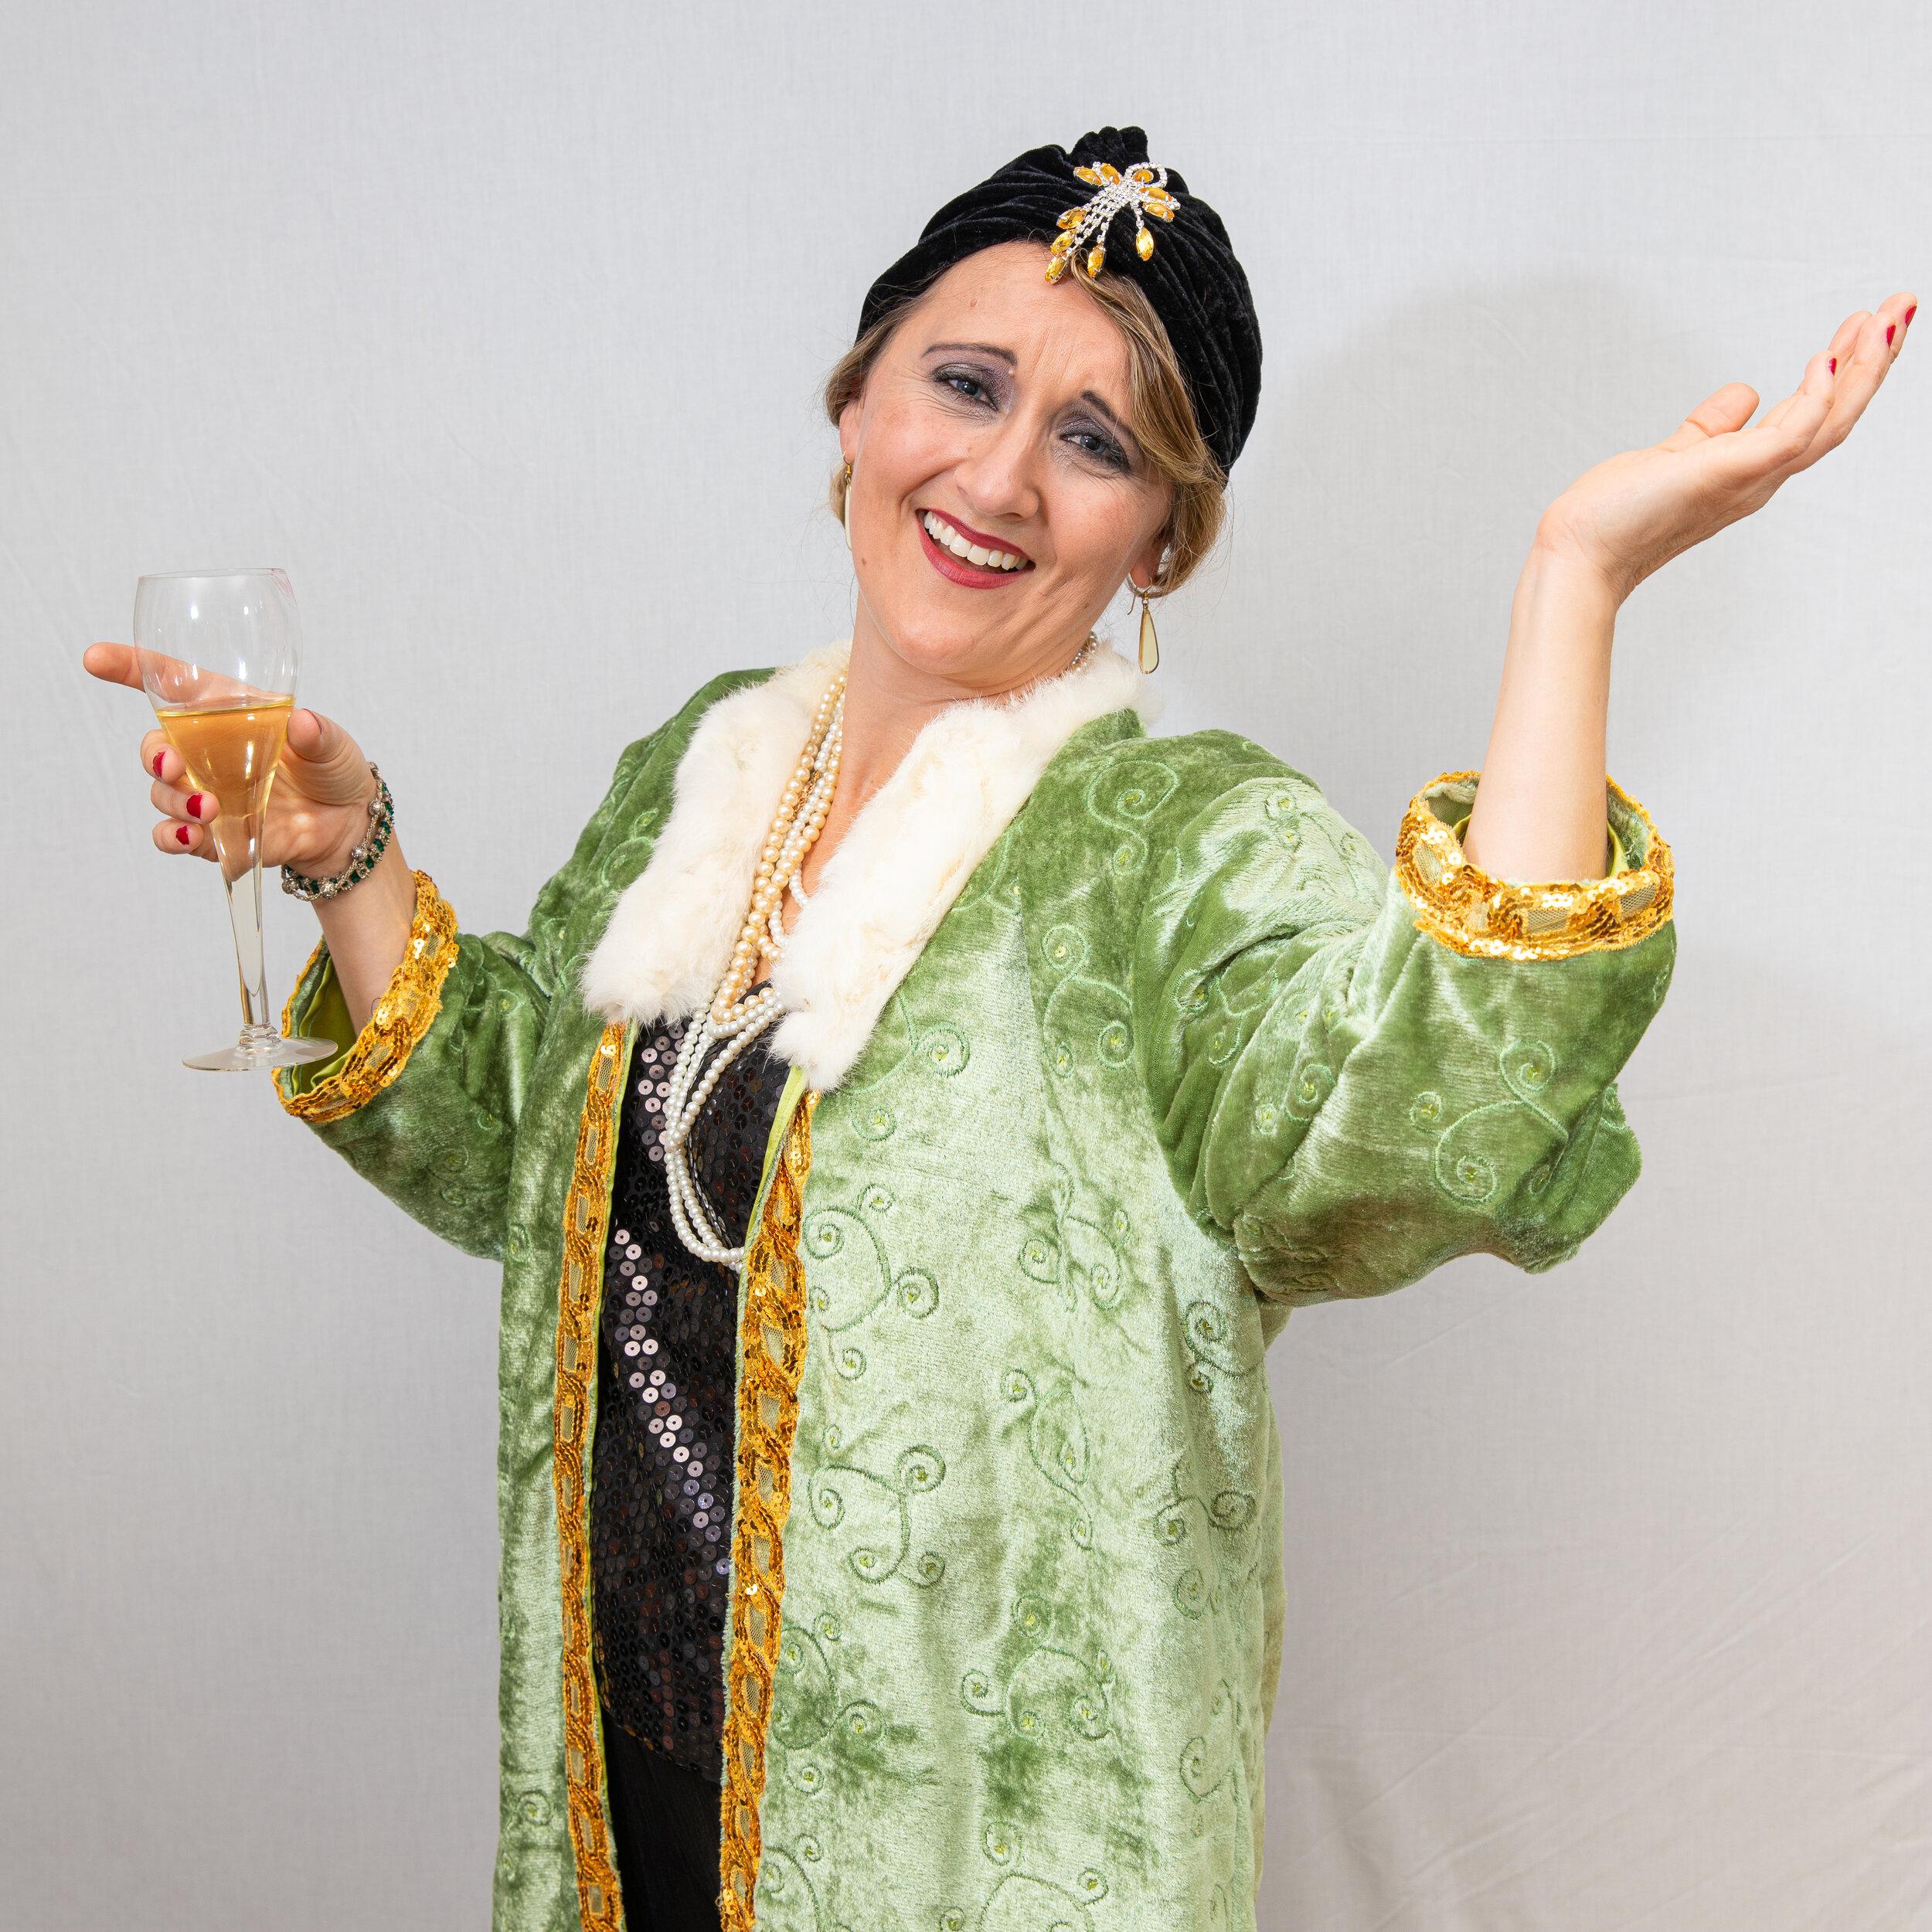 Tasha McCabe as The Drowsy Chaperone